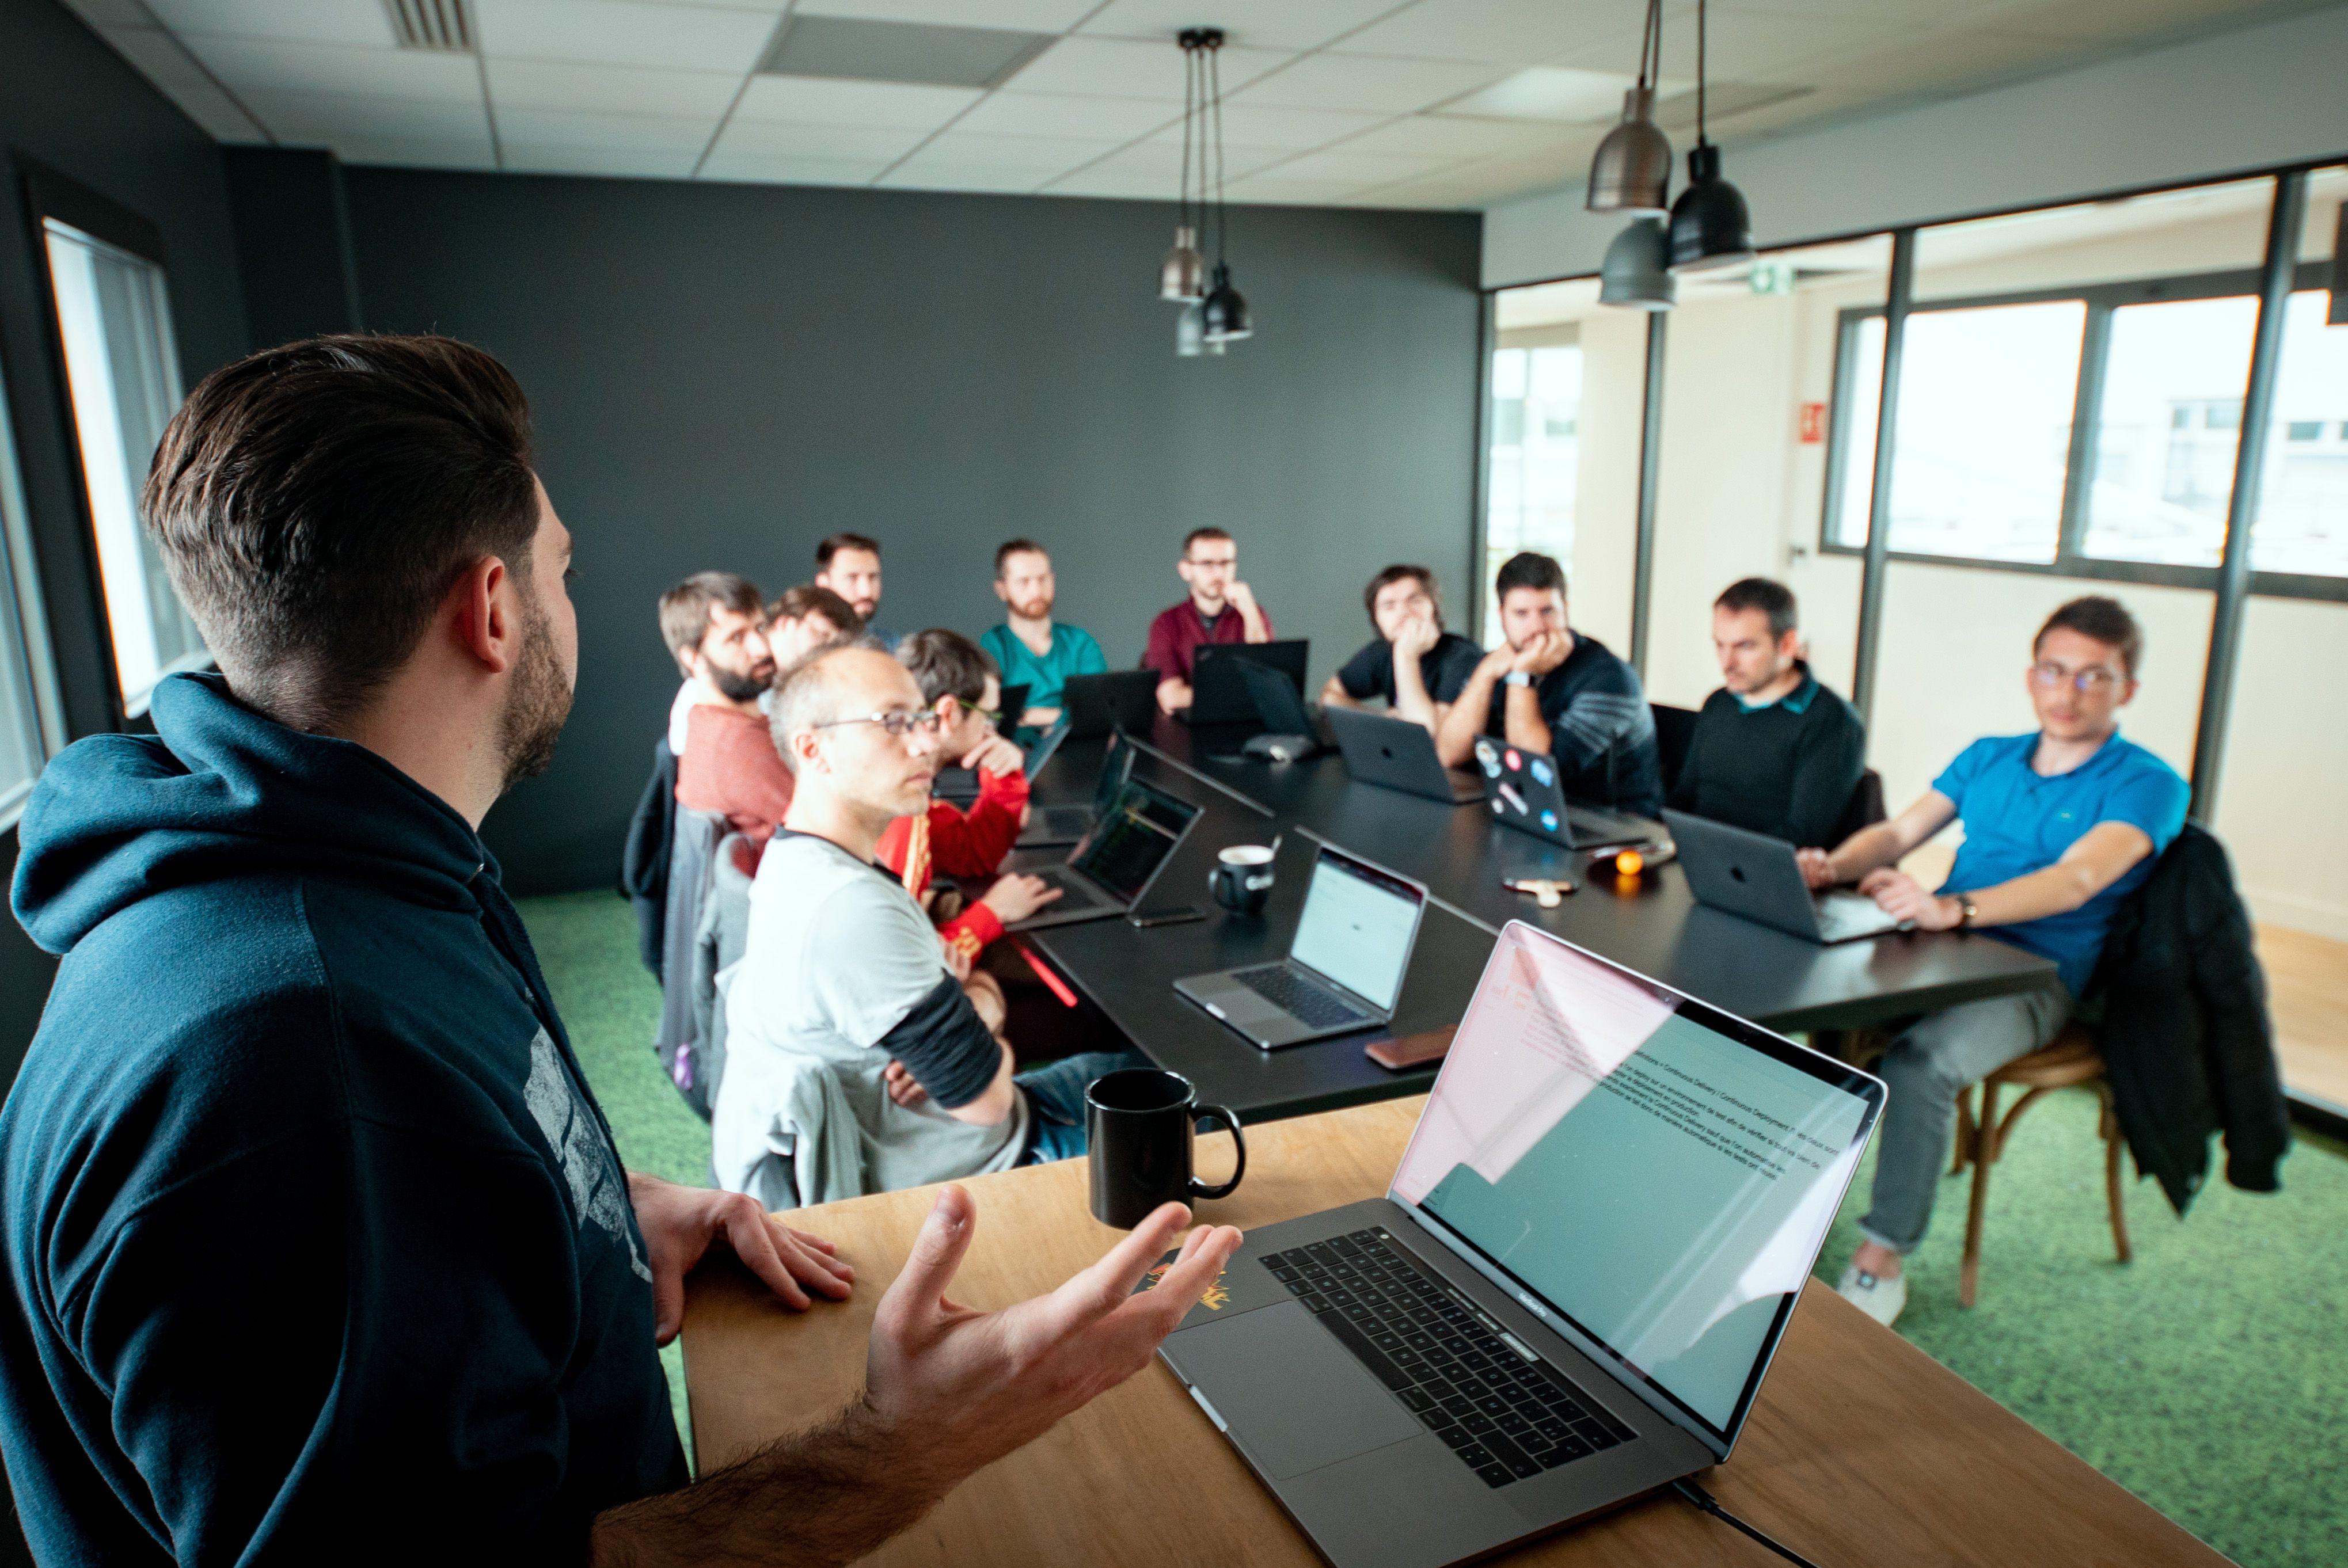 workshop turing 22 salle de reunion